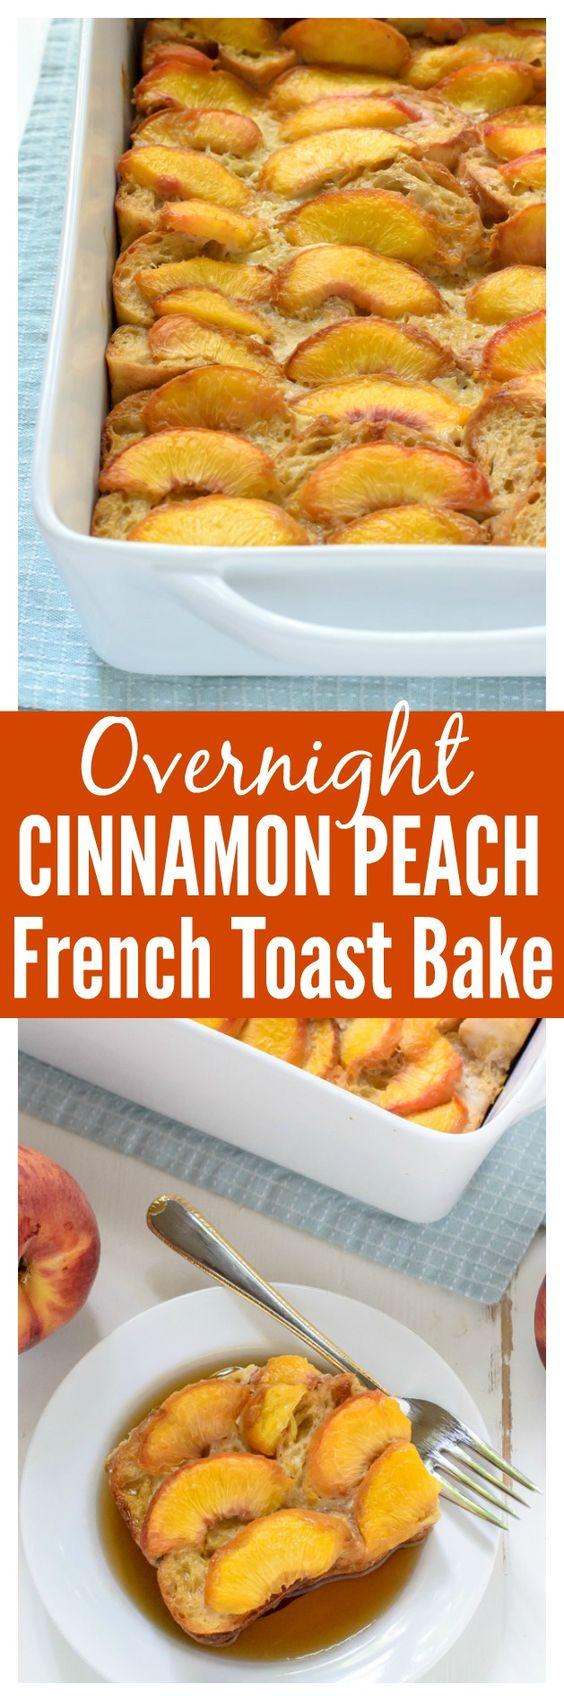 Overnight Cinnamon Peach French Toast Bake. Fun and easy breakfast recipe.